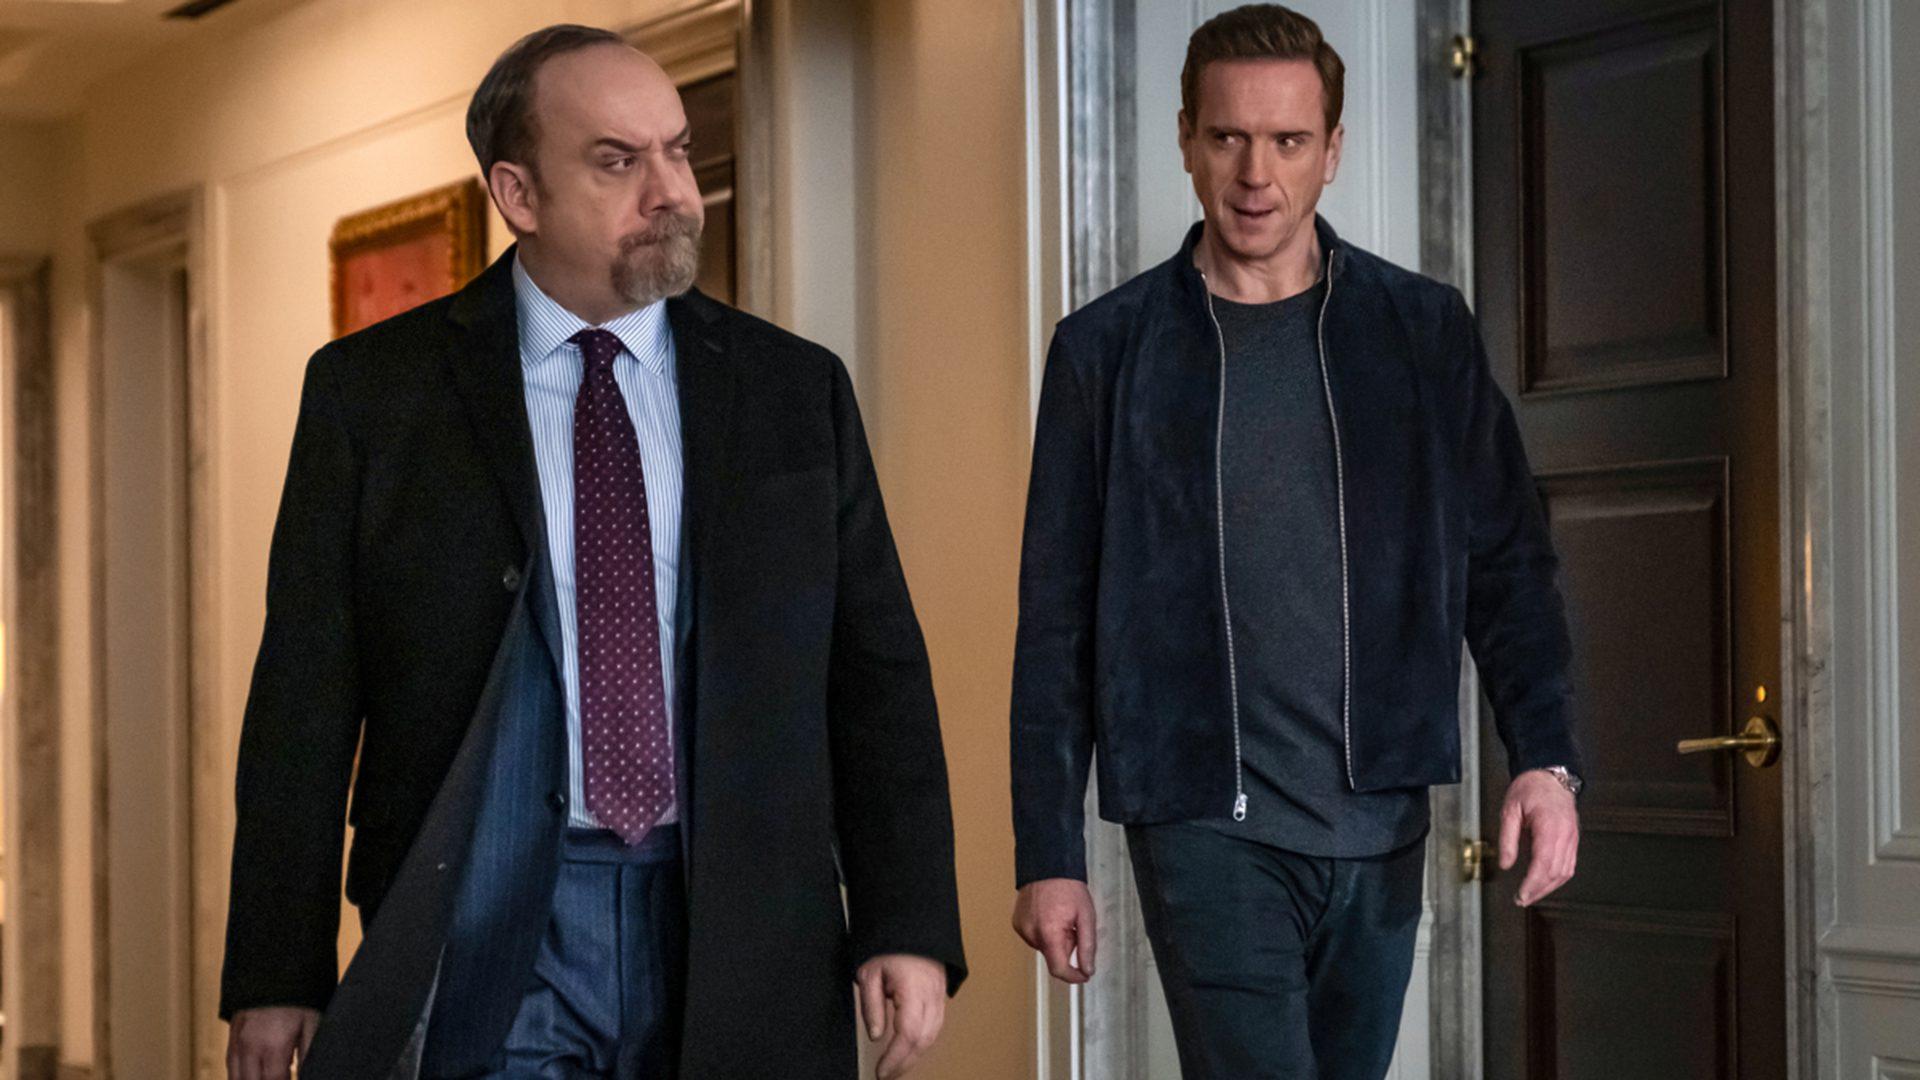 Billions Season 5 Episode 10